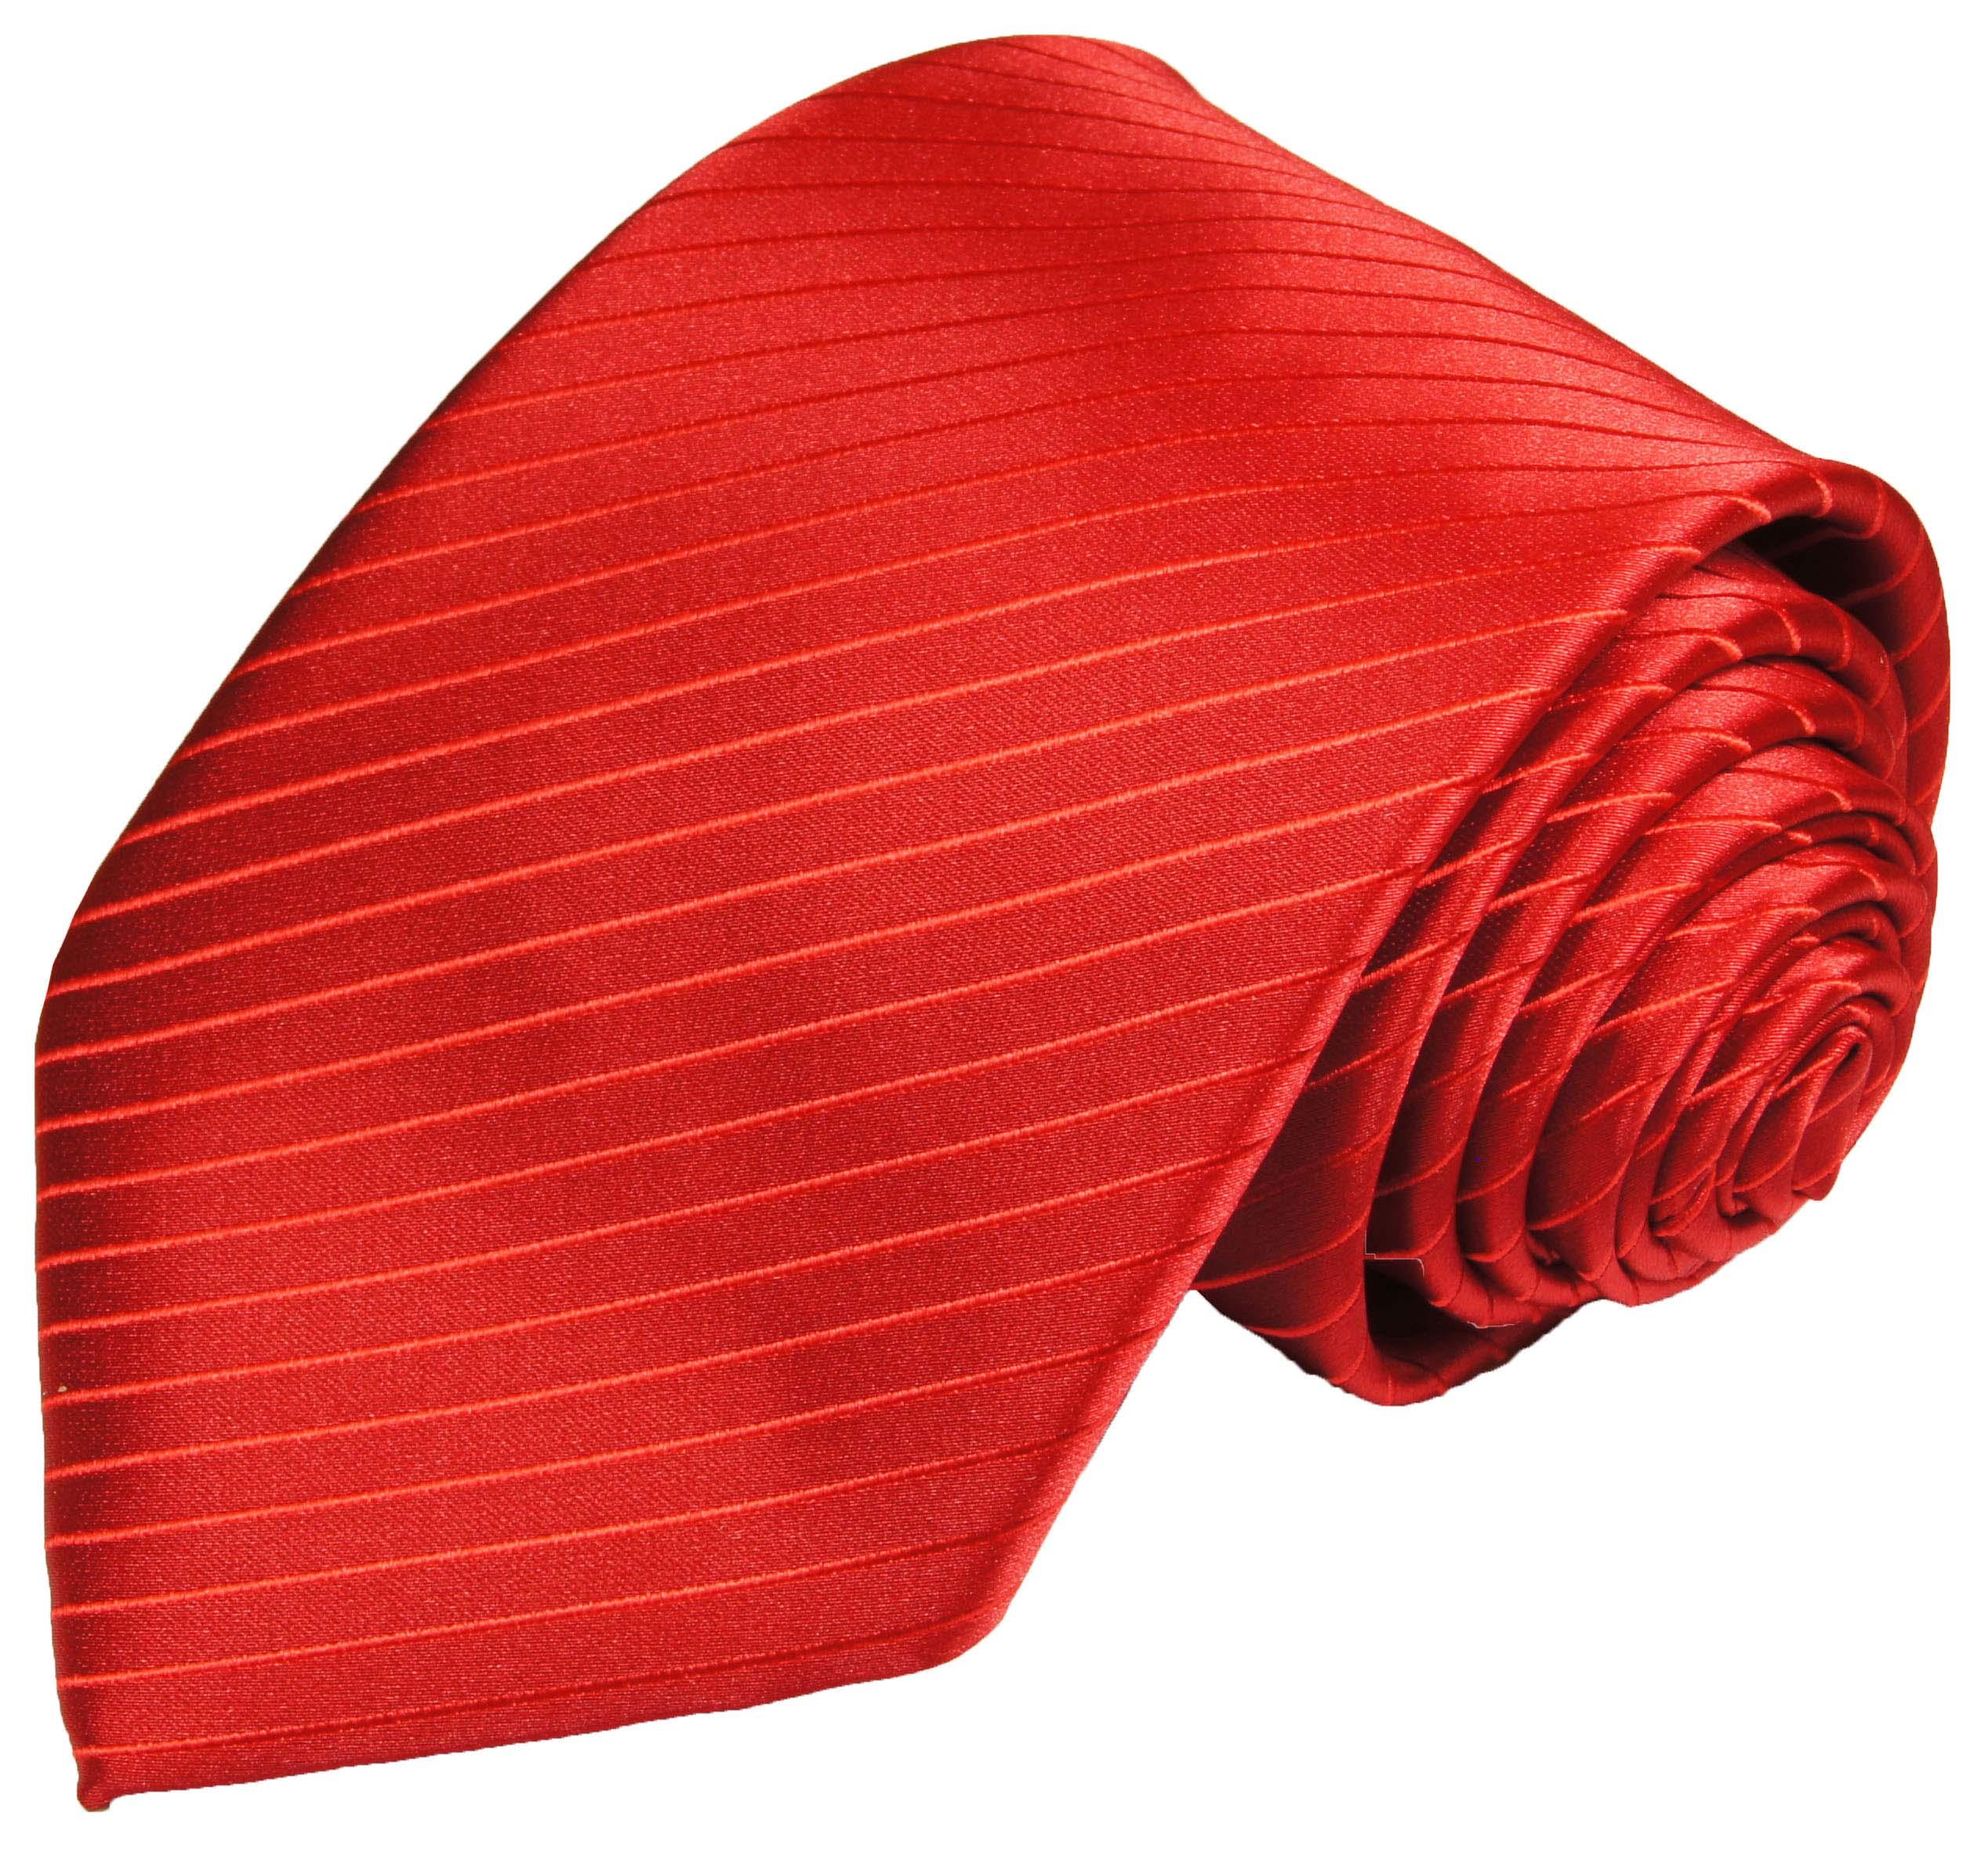 paul malone shop hochzeitsweste mit krawatte rot uni. Black Bedroom Furniture Sets. Home Design Ideas